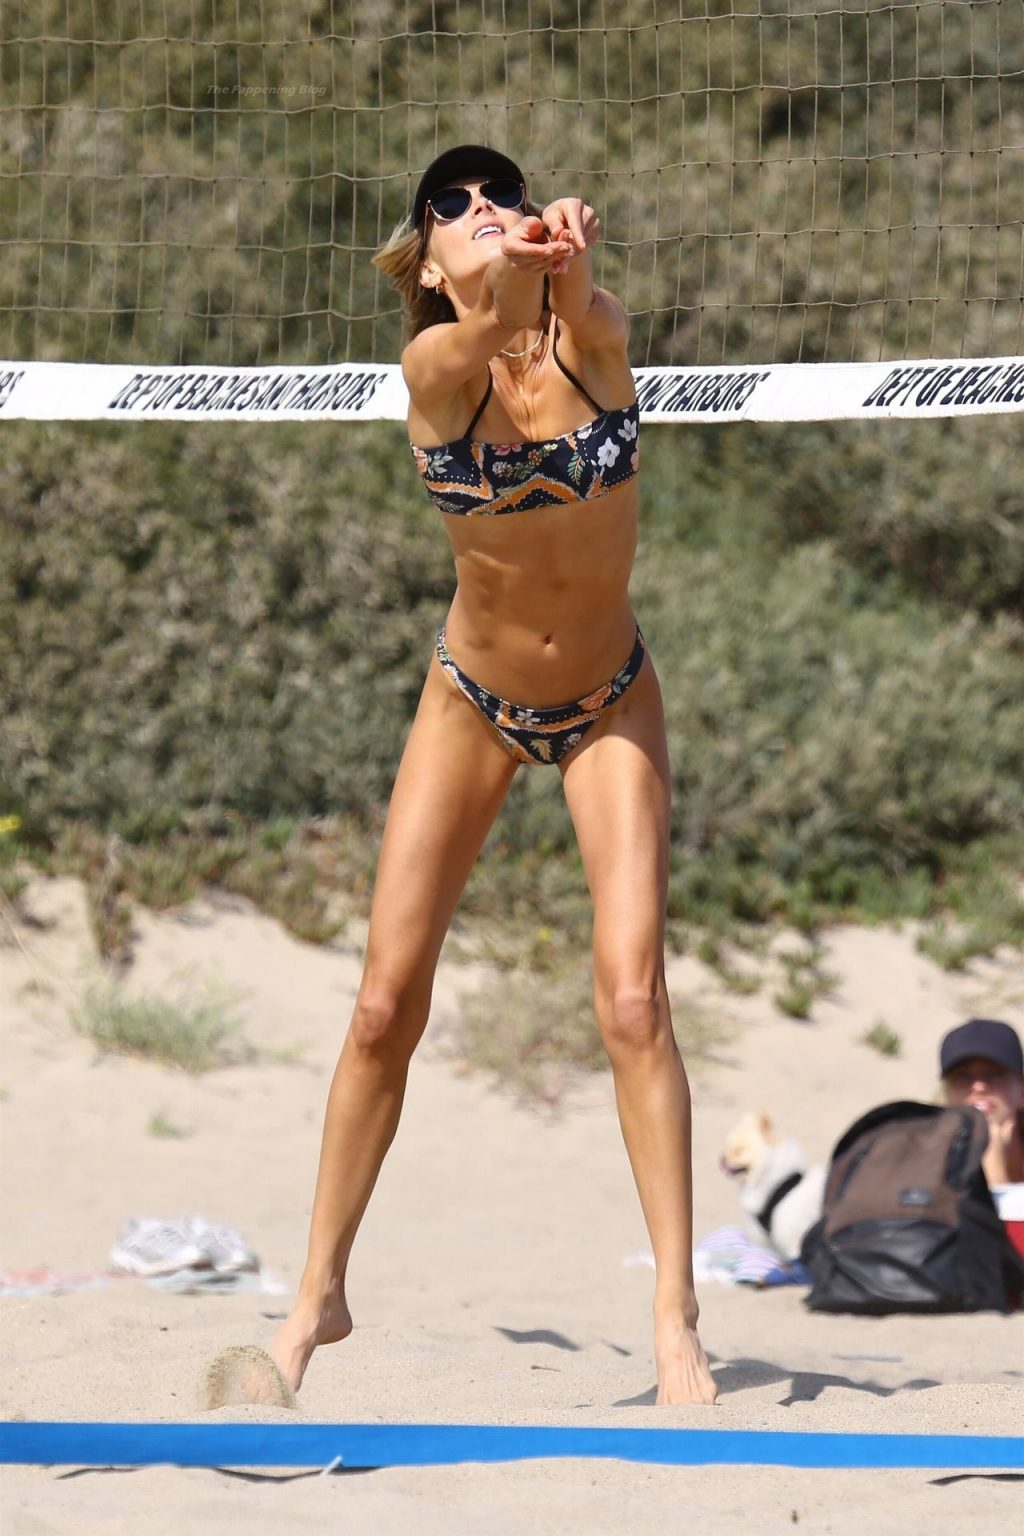 Ludi Delfino Enjoys a Day on the Beach (25 Photos)